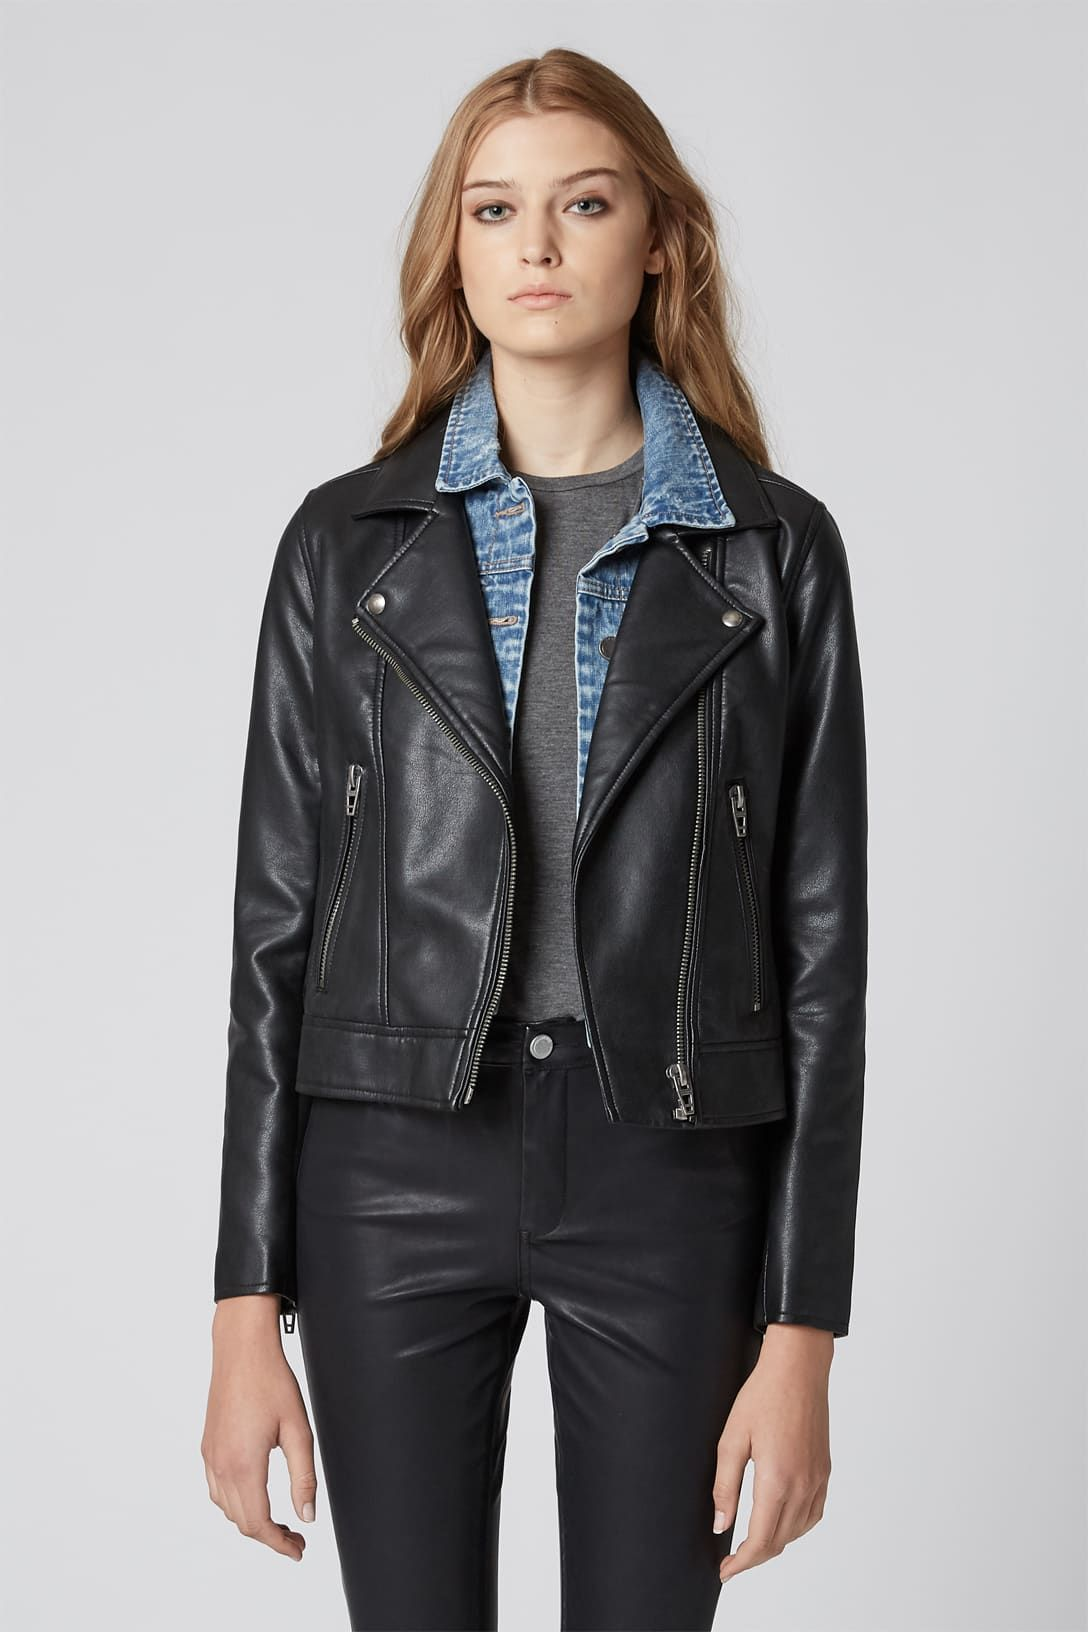 Faux Leather Jacket Best Fall Jackets For Women